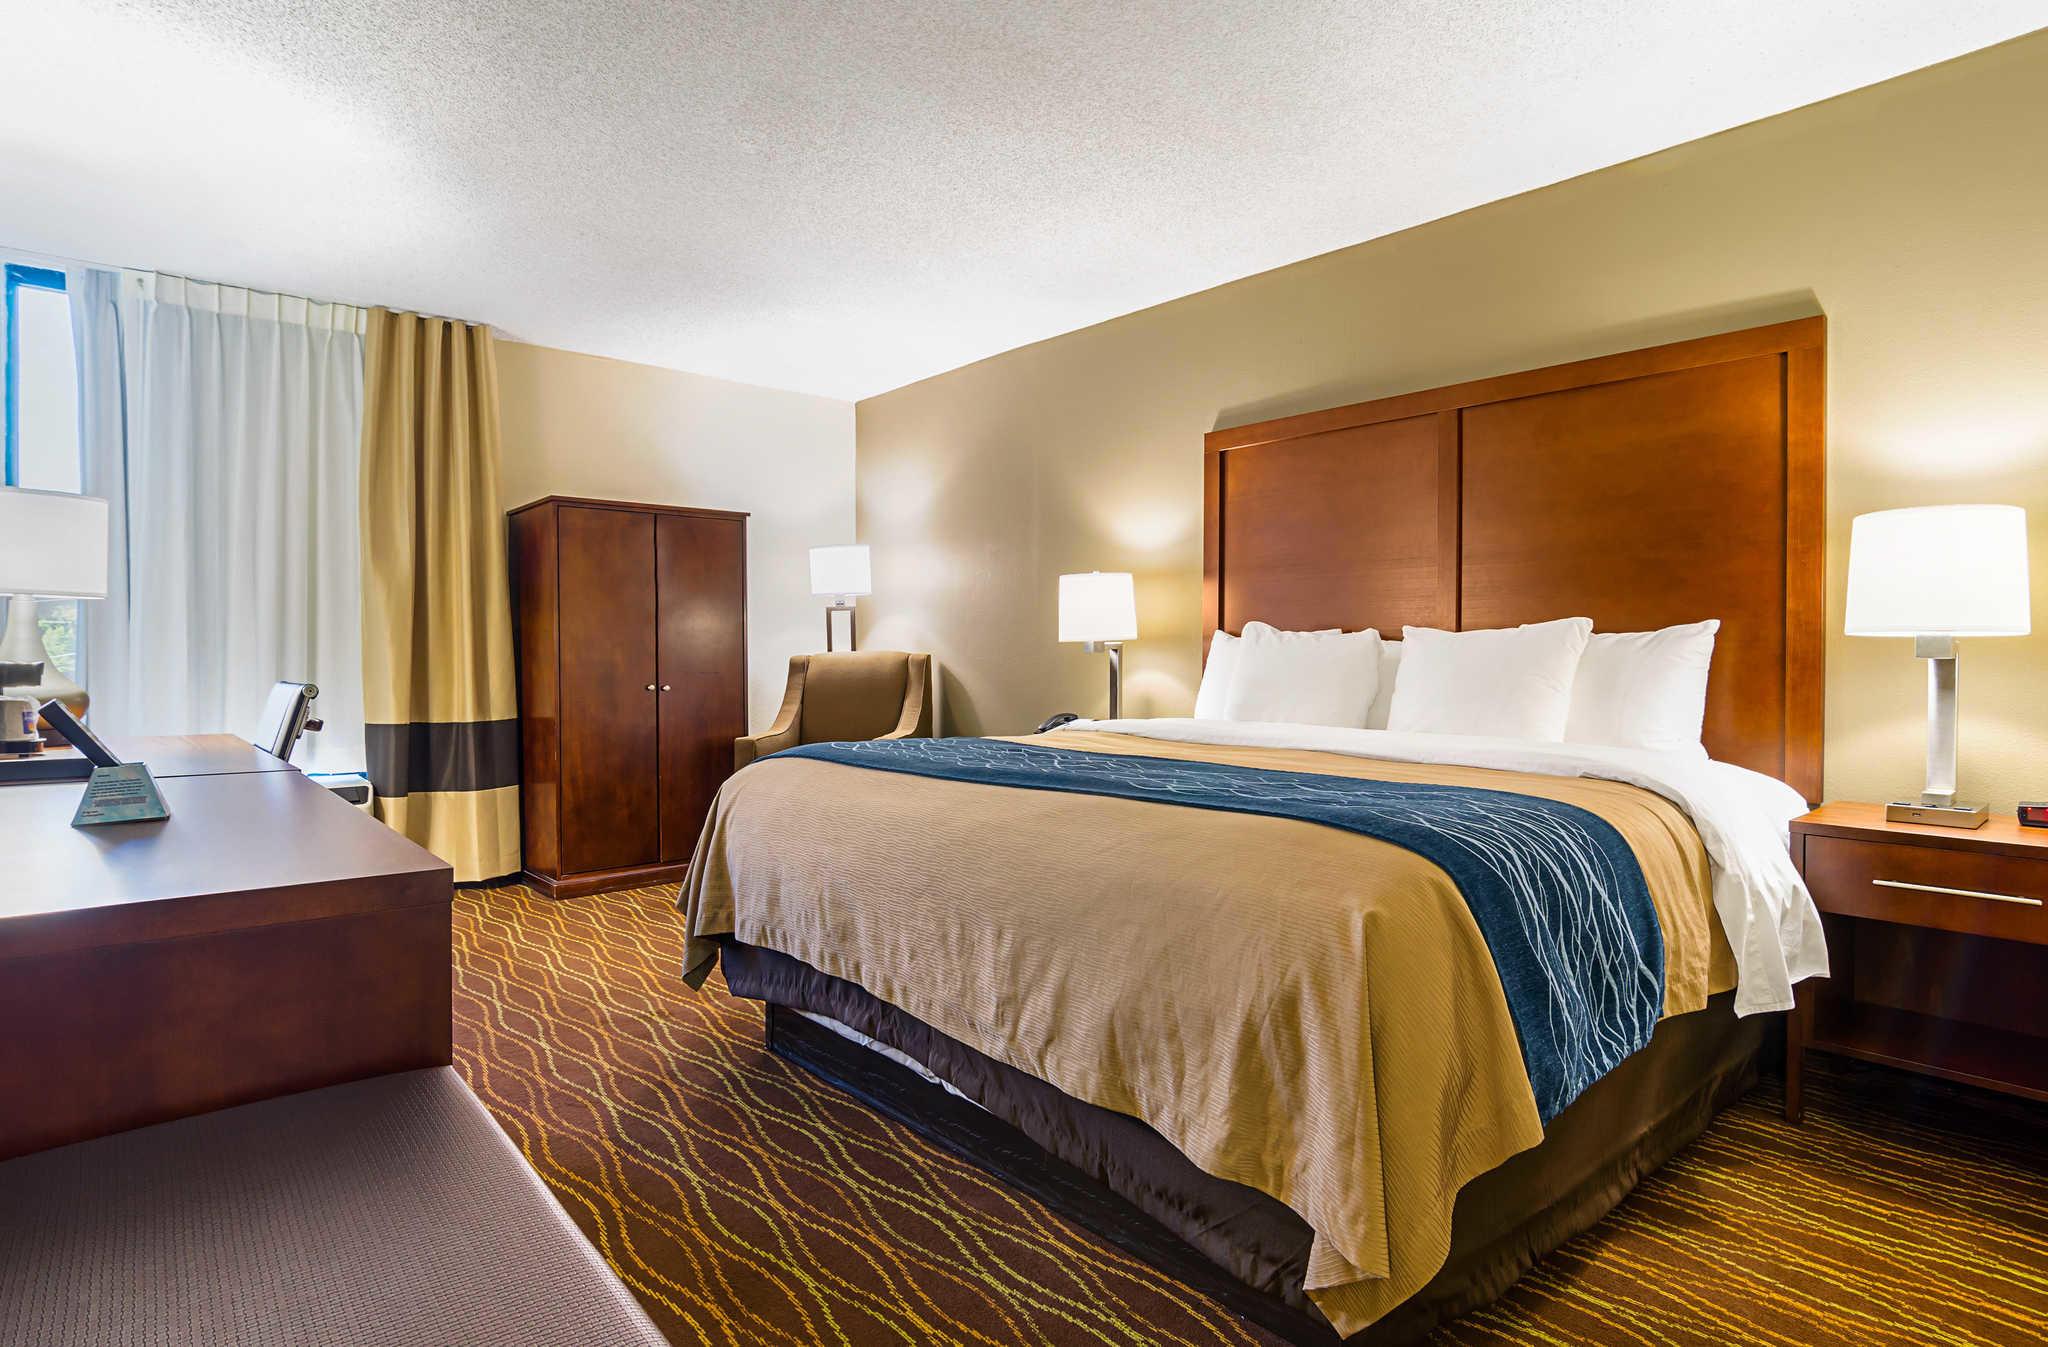 Comfort Inn & Suites Duke University-Downtown image 7